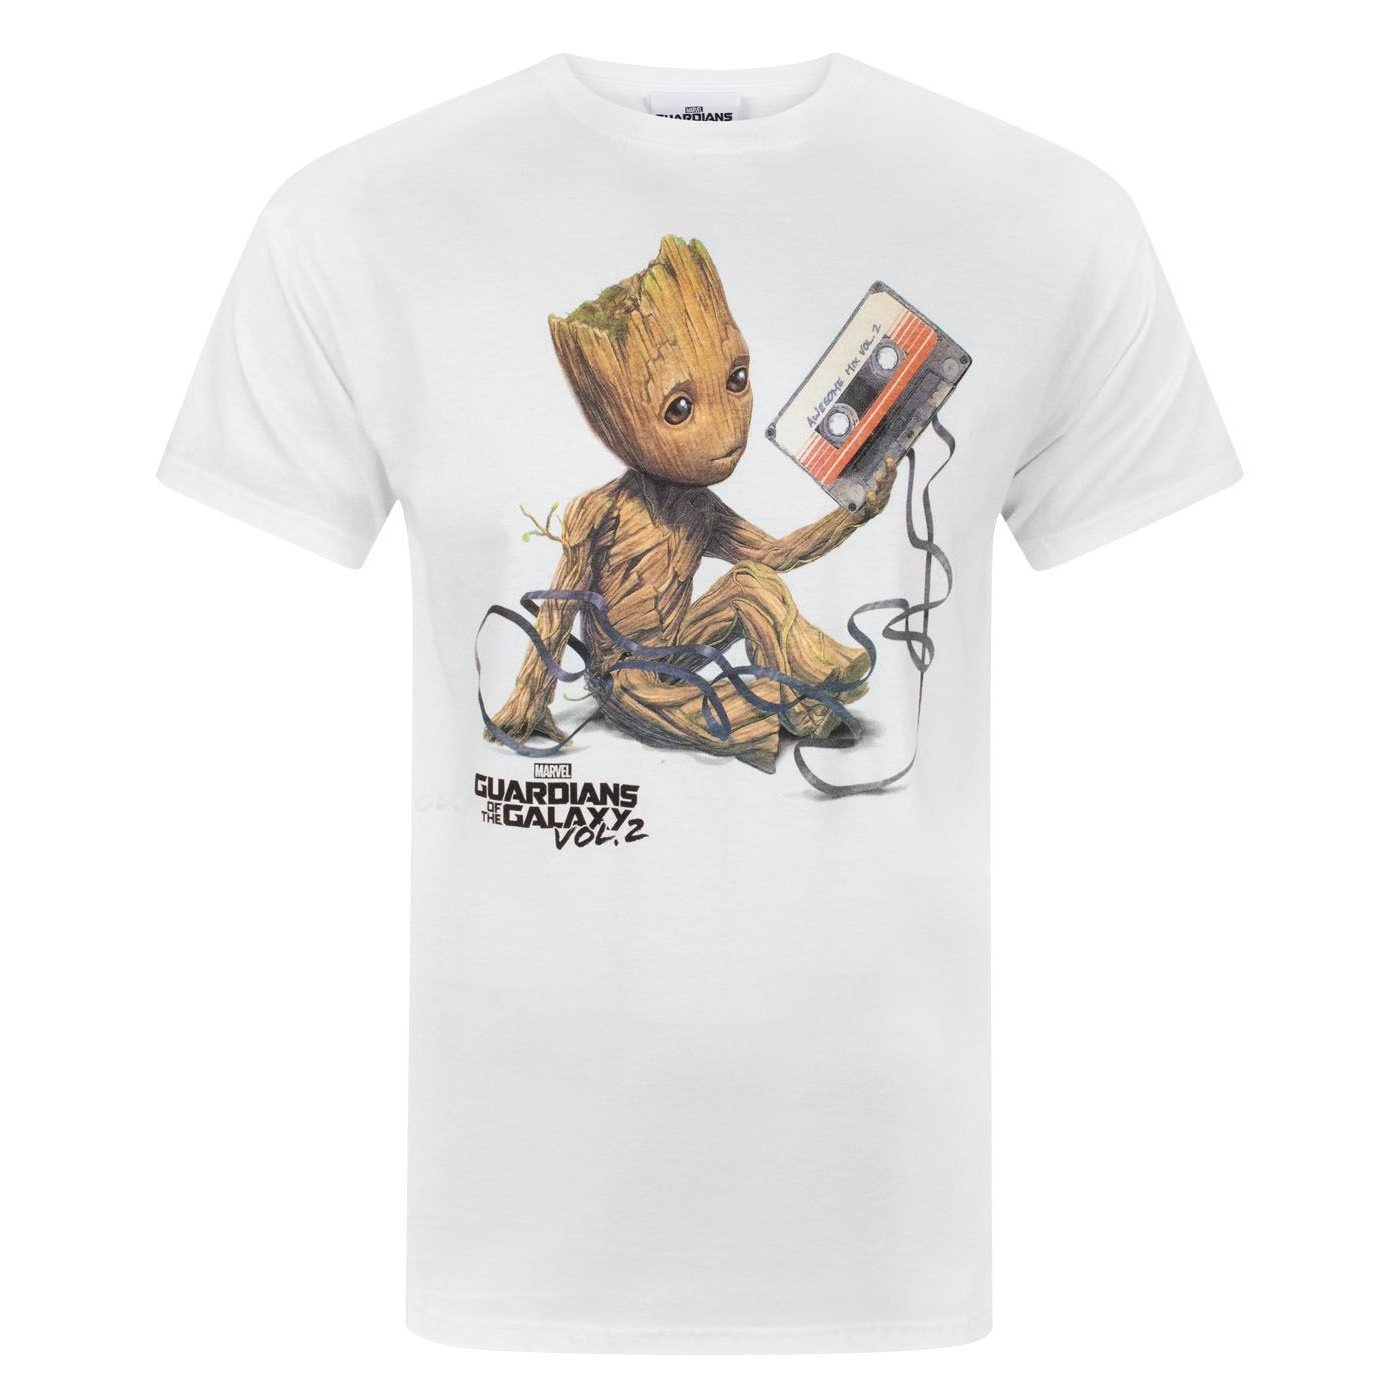 S Vol 2 Tape T Shirt 5294